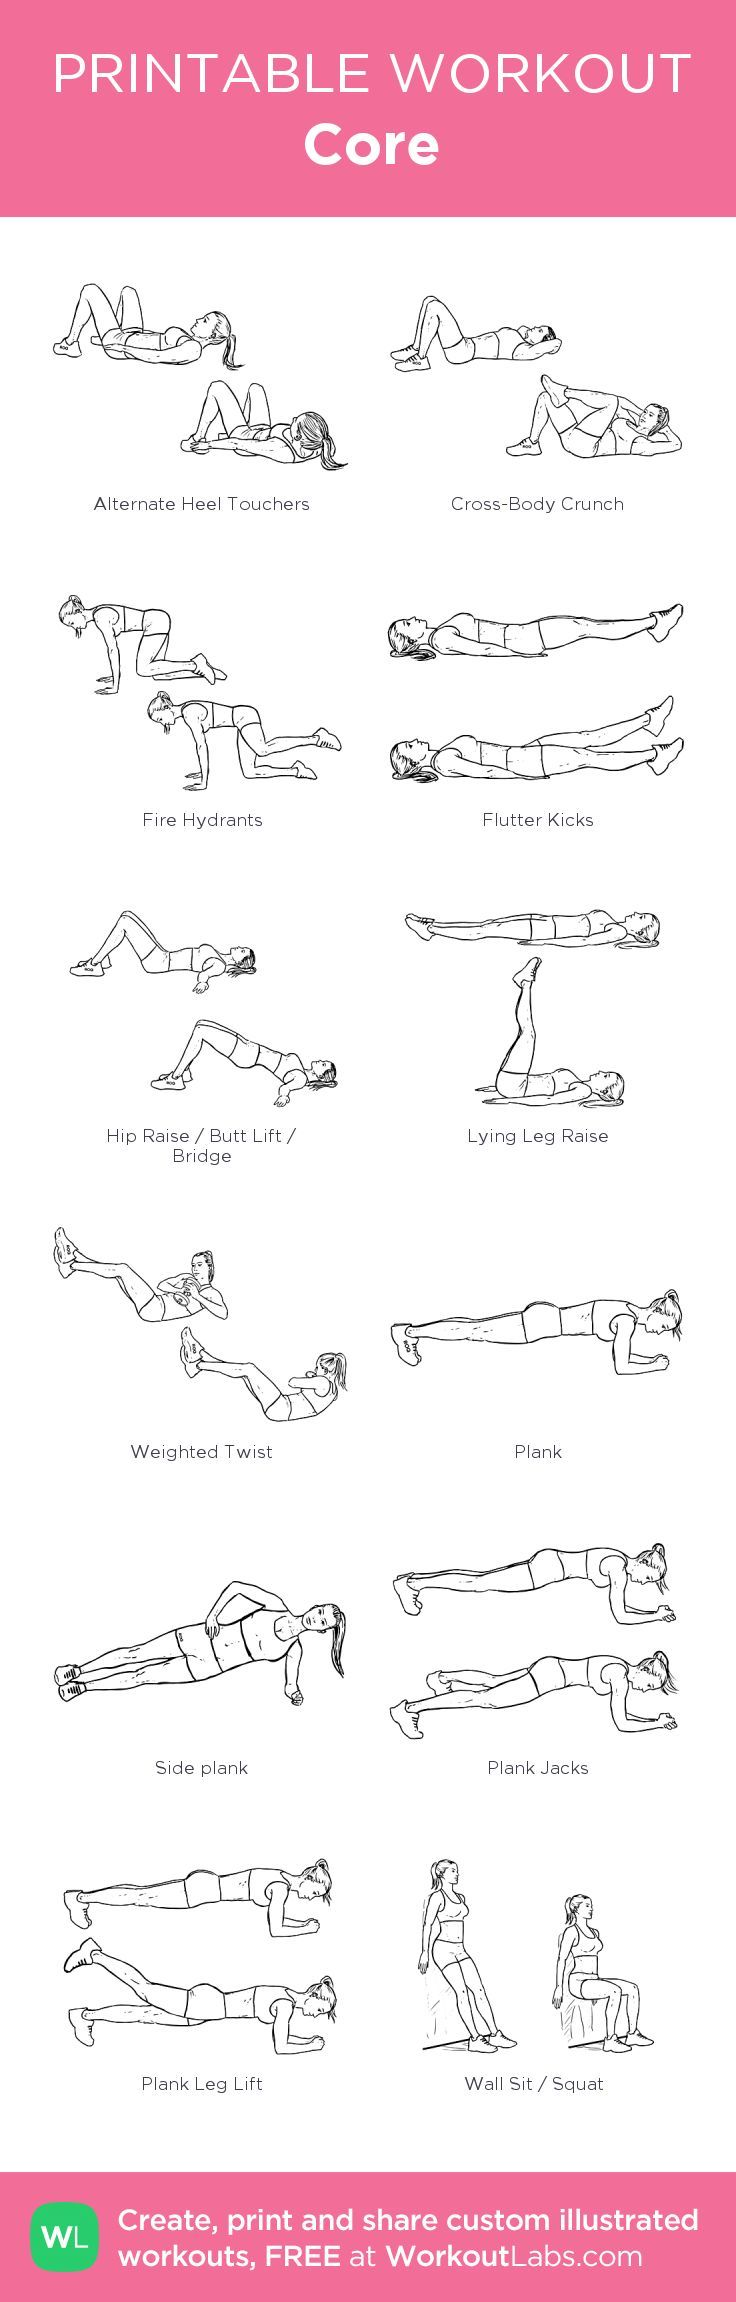 Core: my custom printable workout by @WorkoutLabs #workoutlabs #customworkout